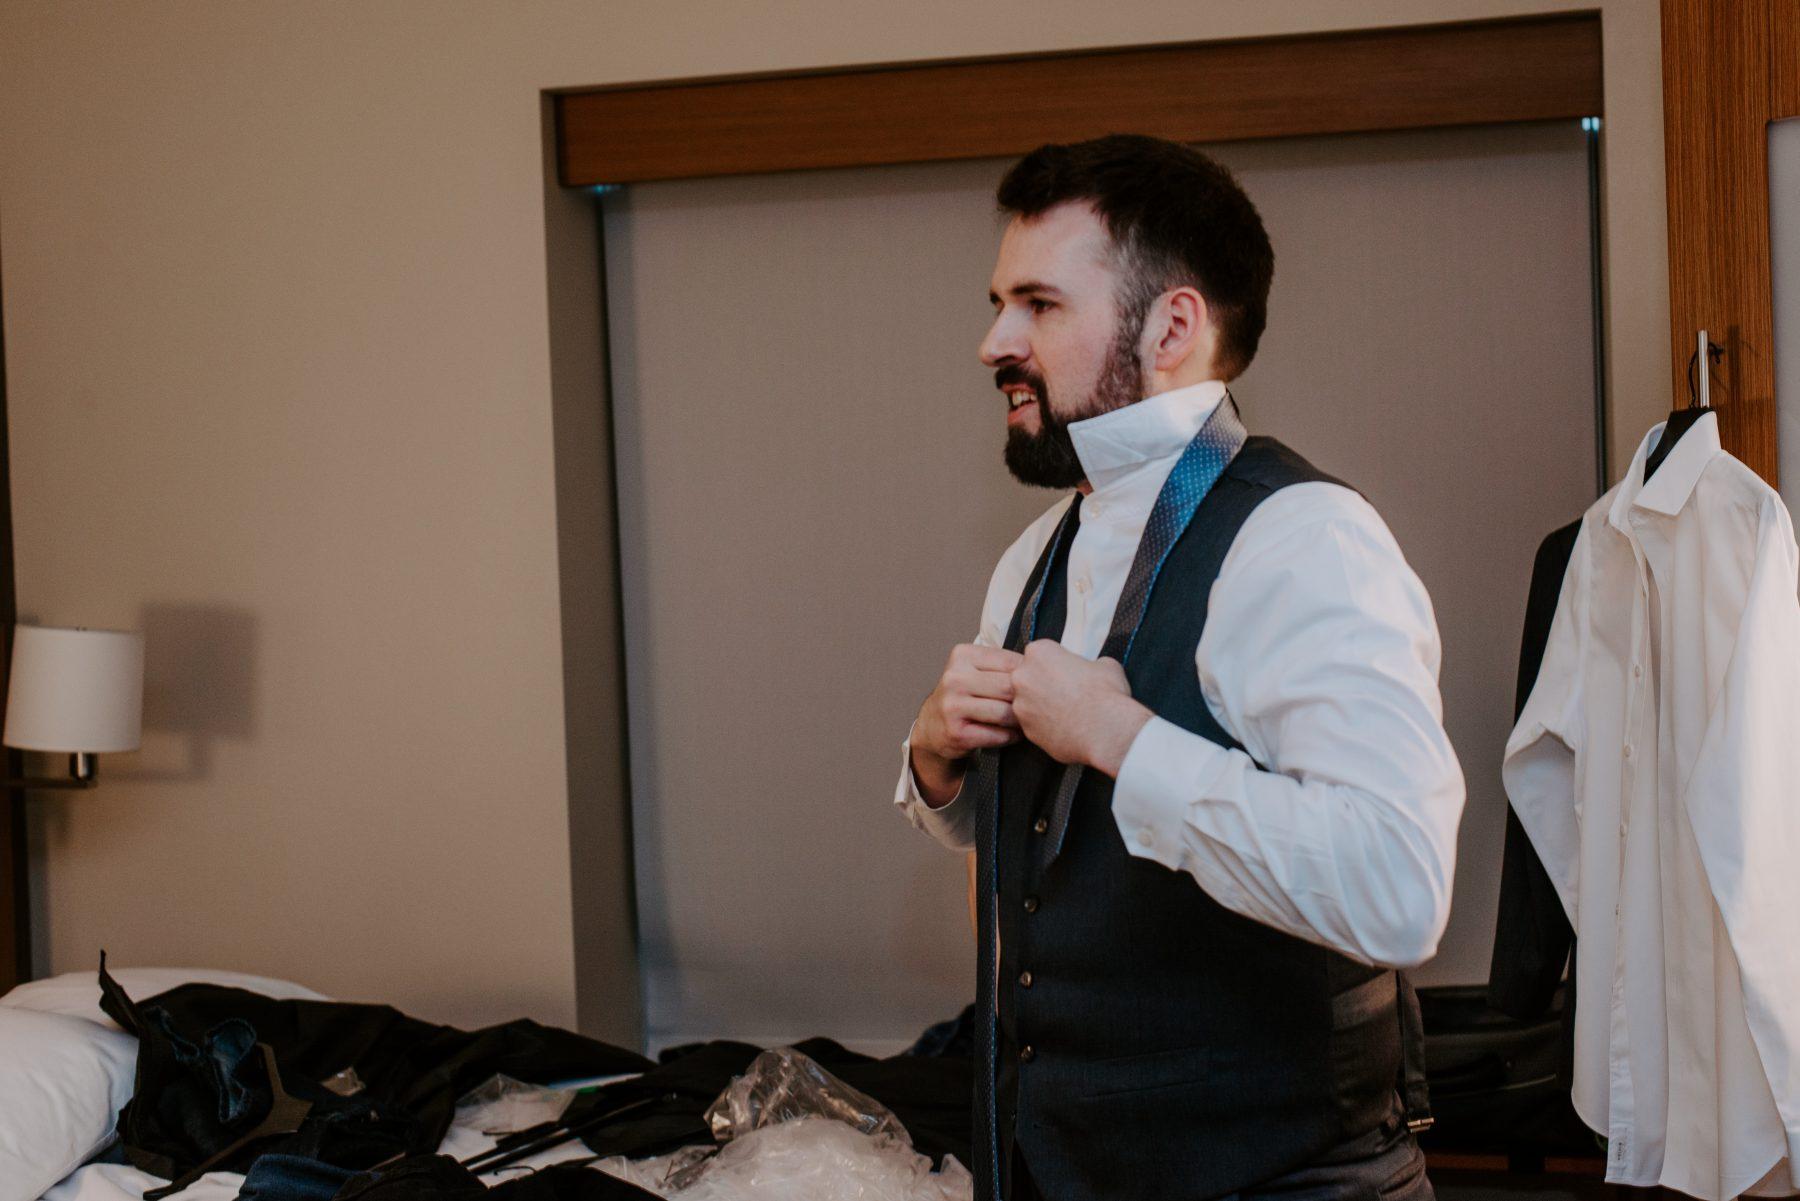 Rhodes on the Pawtuxet Cranston Wedding Ashley and David Blueflash Photography 2